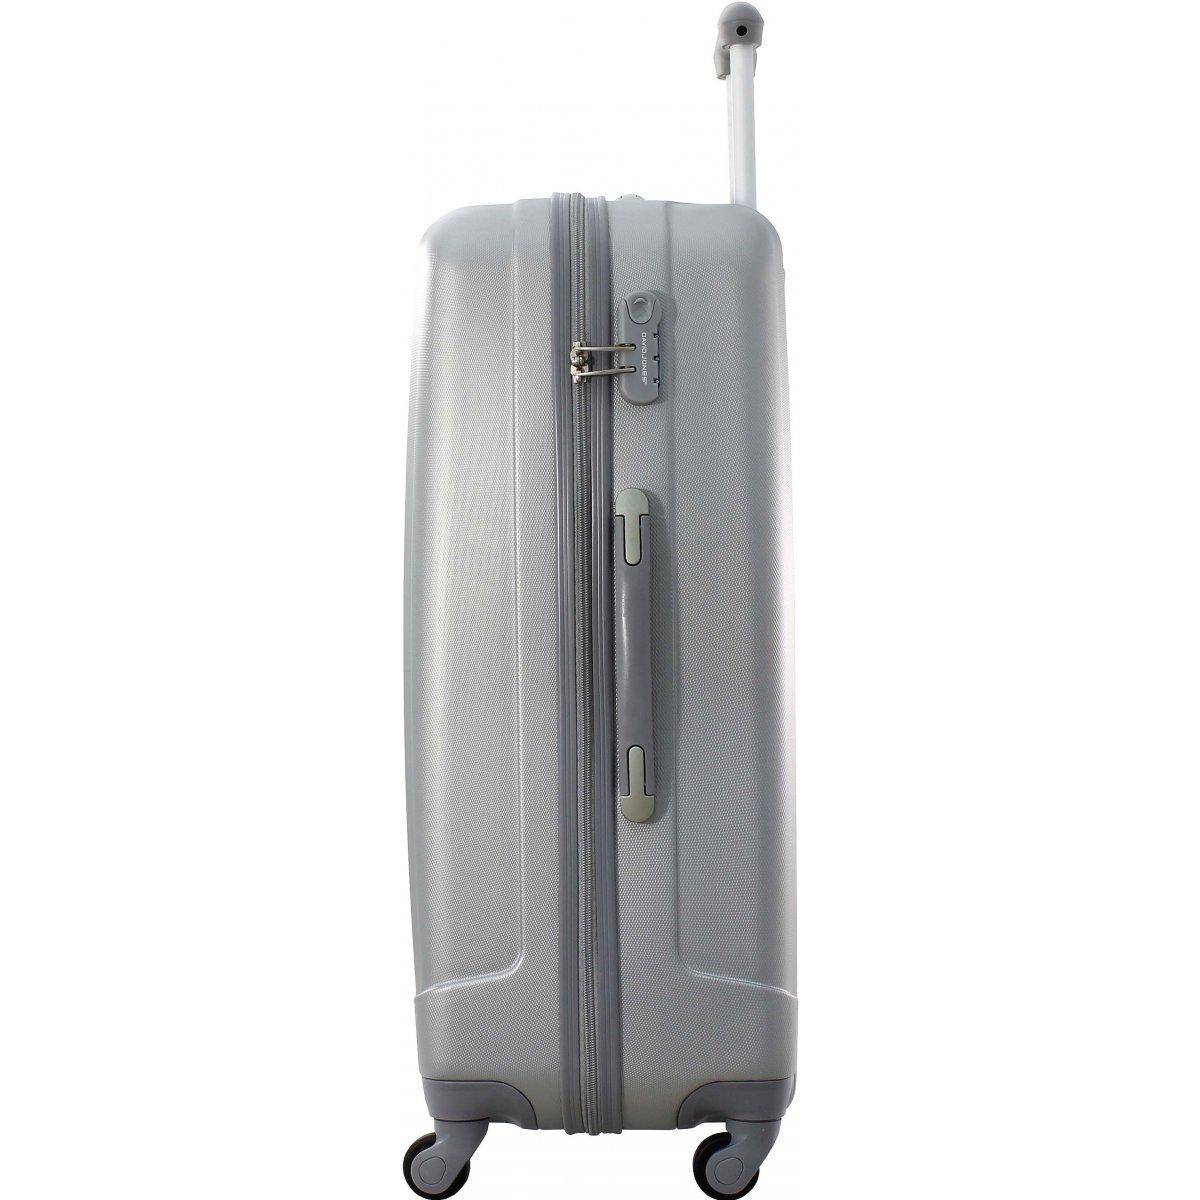 lot 3 valises dont 1 cabine david jones ba10113 couleur principale silver promotion. Black Bedroom Furniture Sets. Home Design Ideas